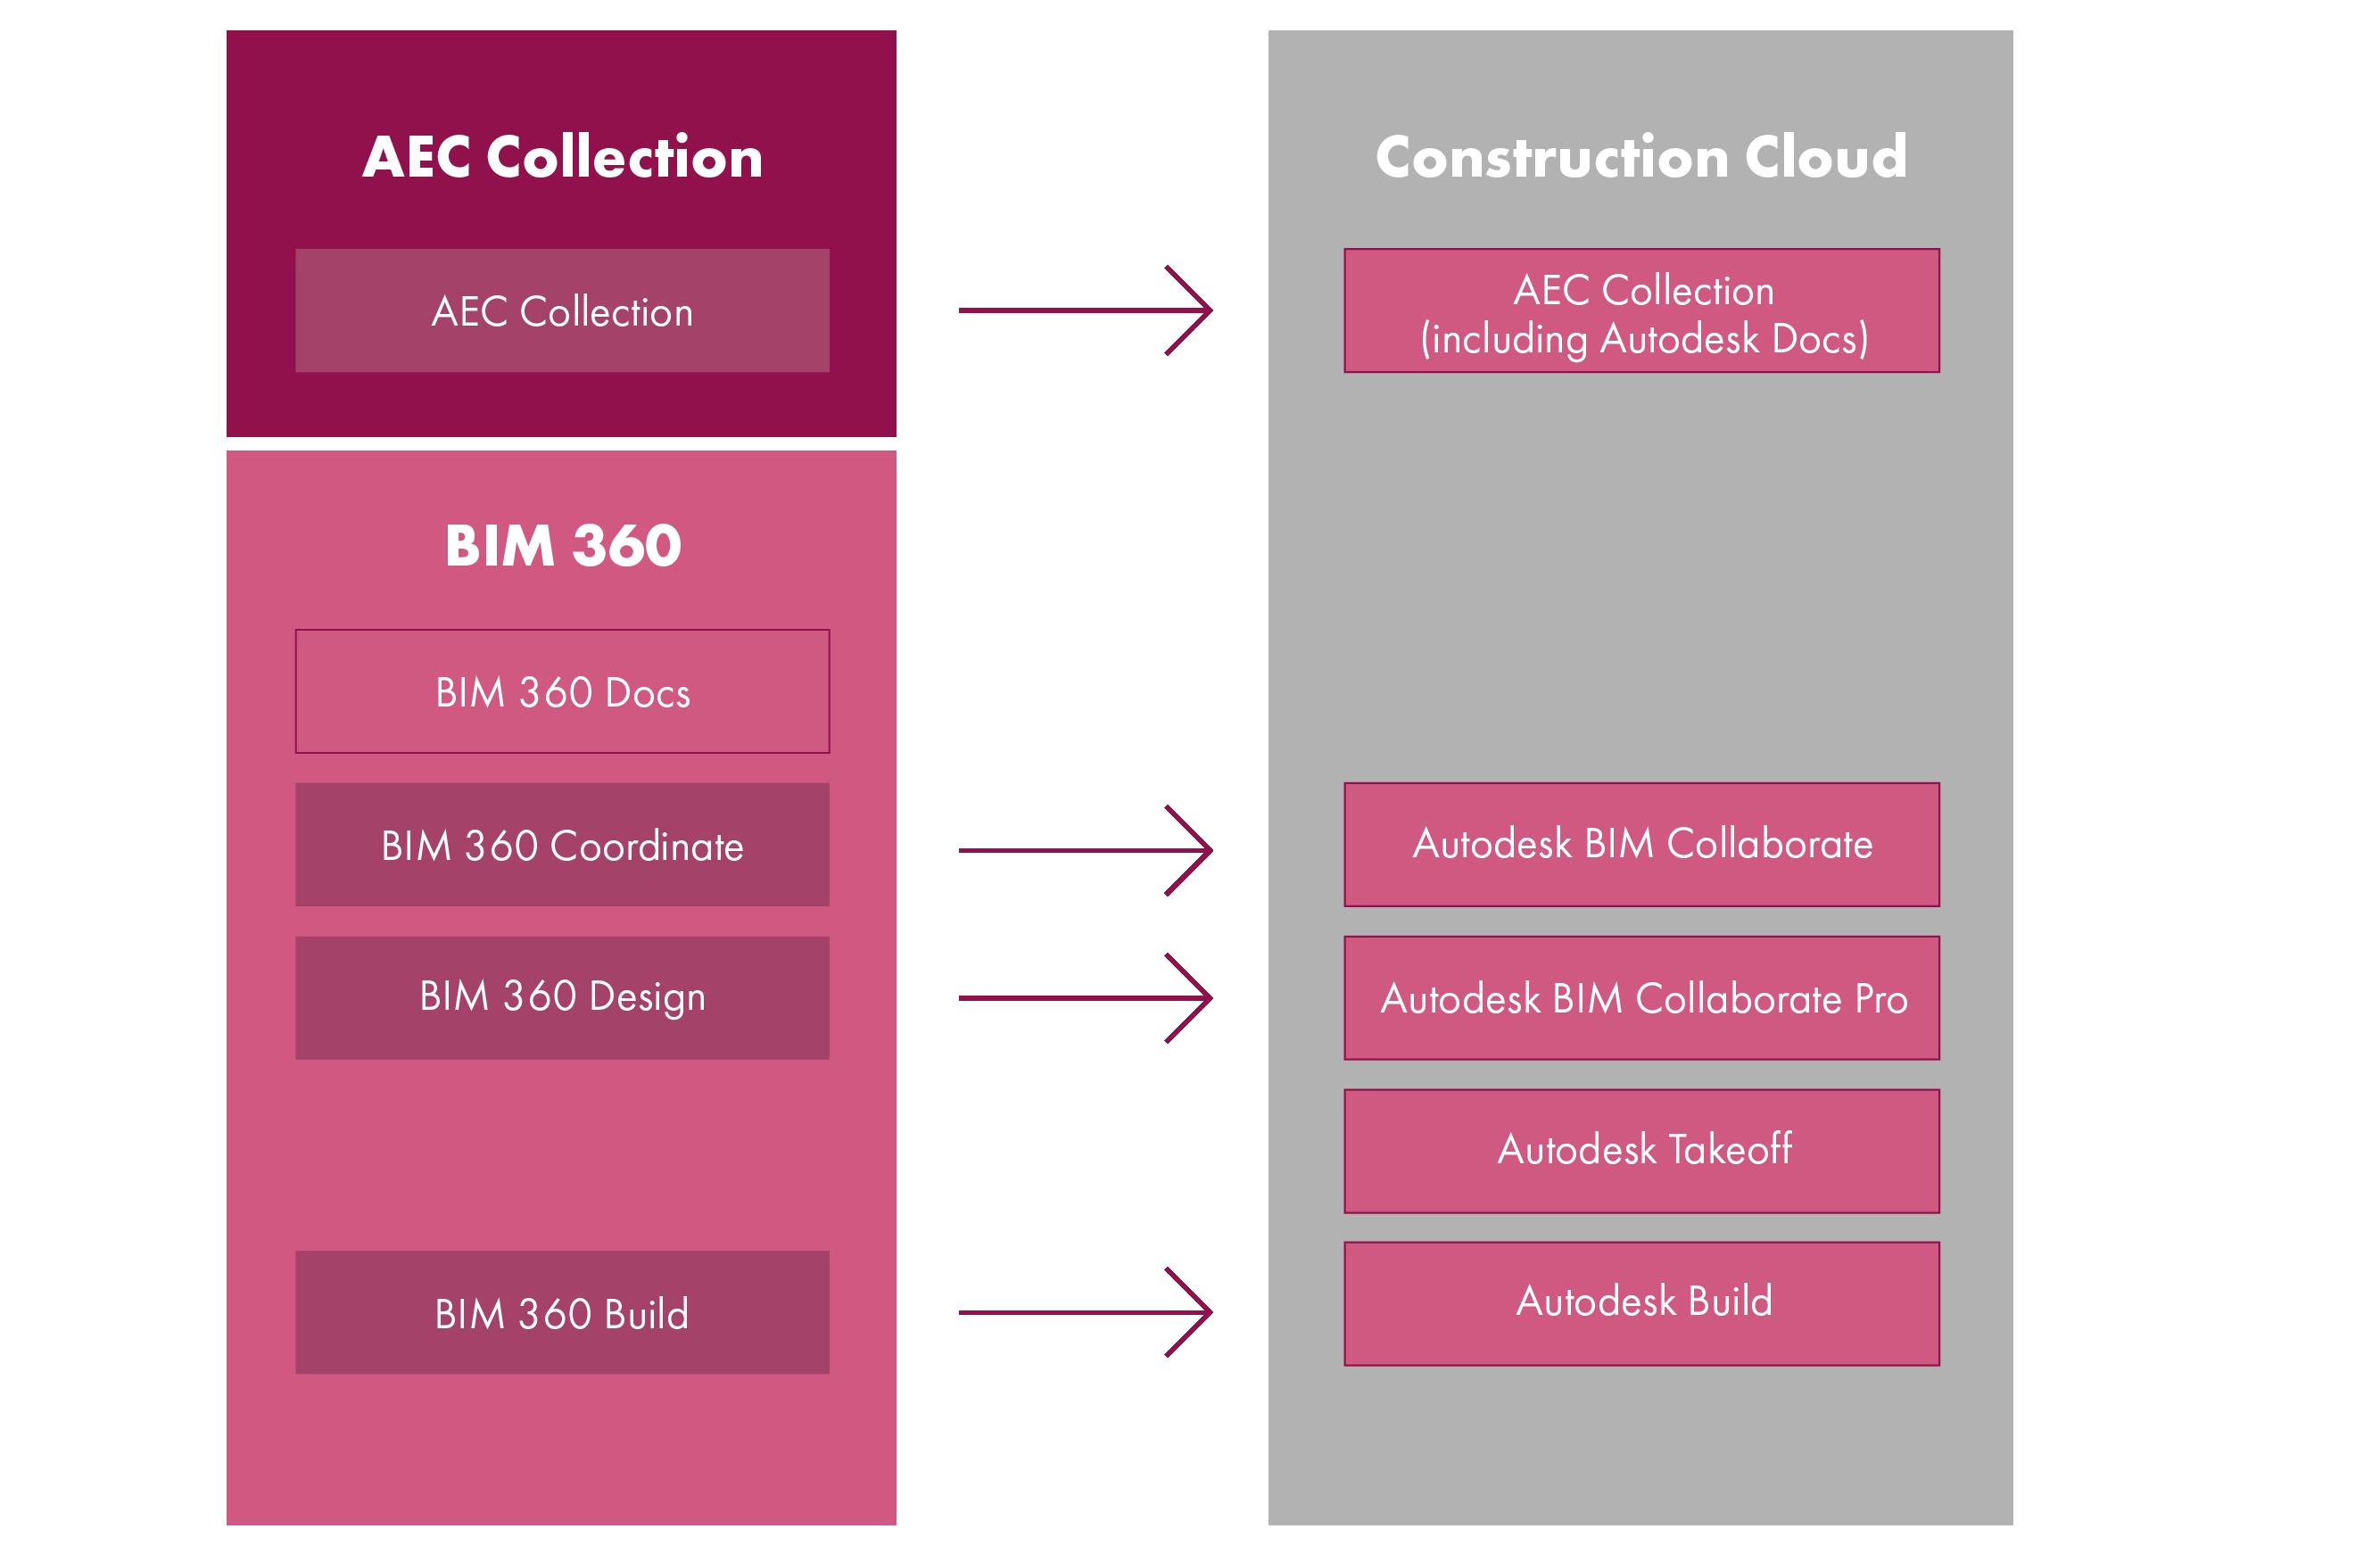 BIM 360 & Construction Cloud